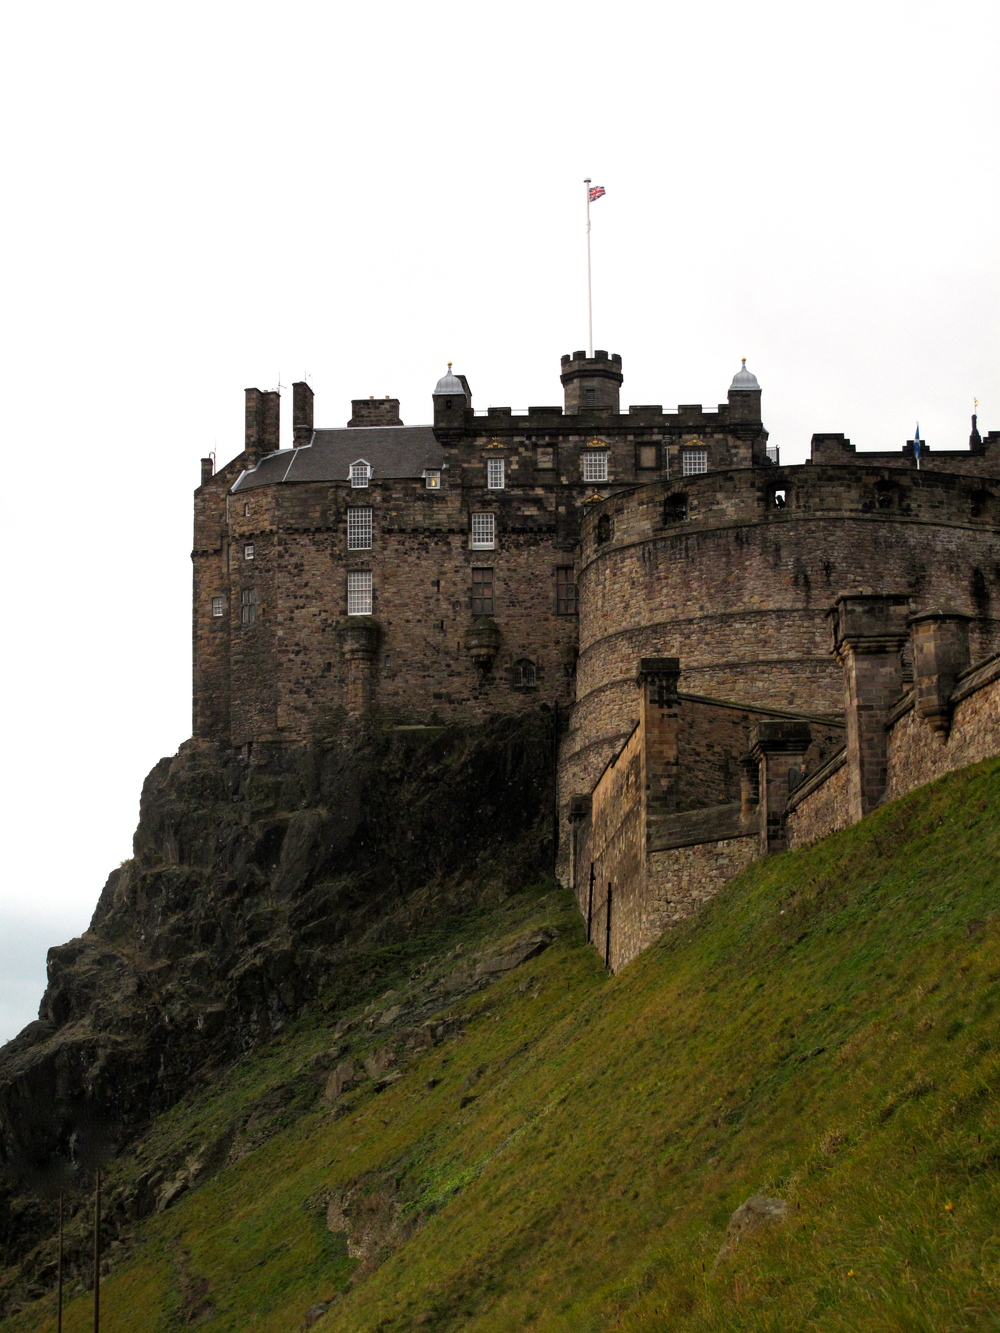 Edinburgh Castle, on a green hill top.